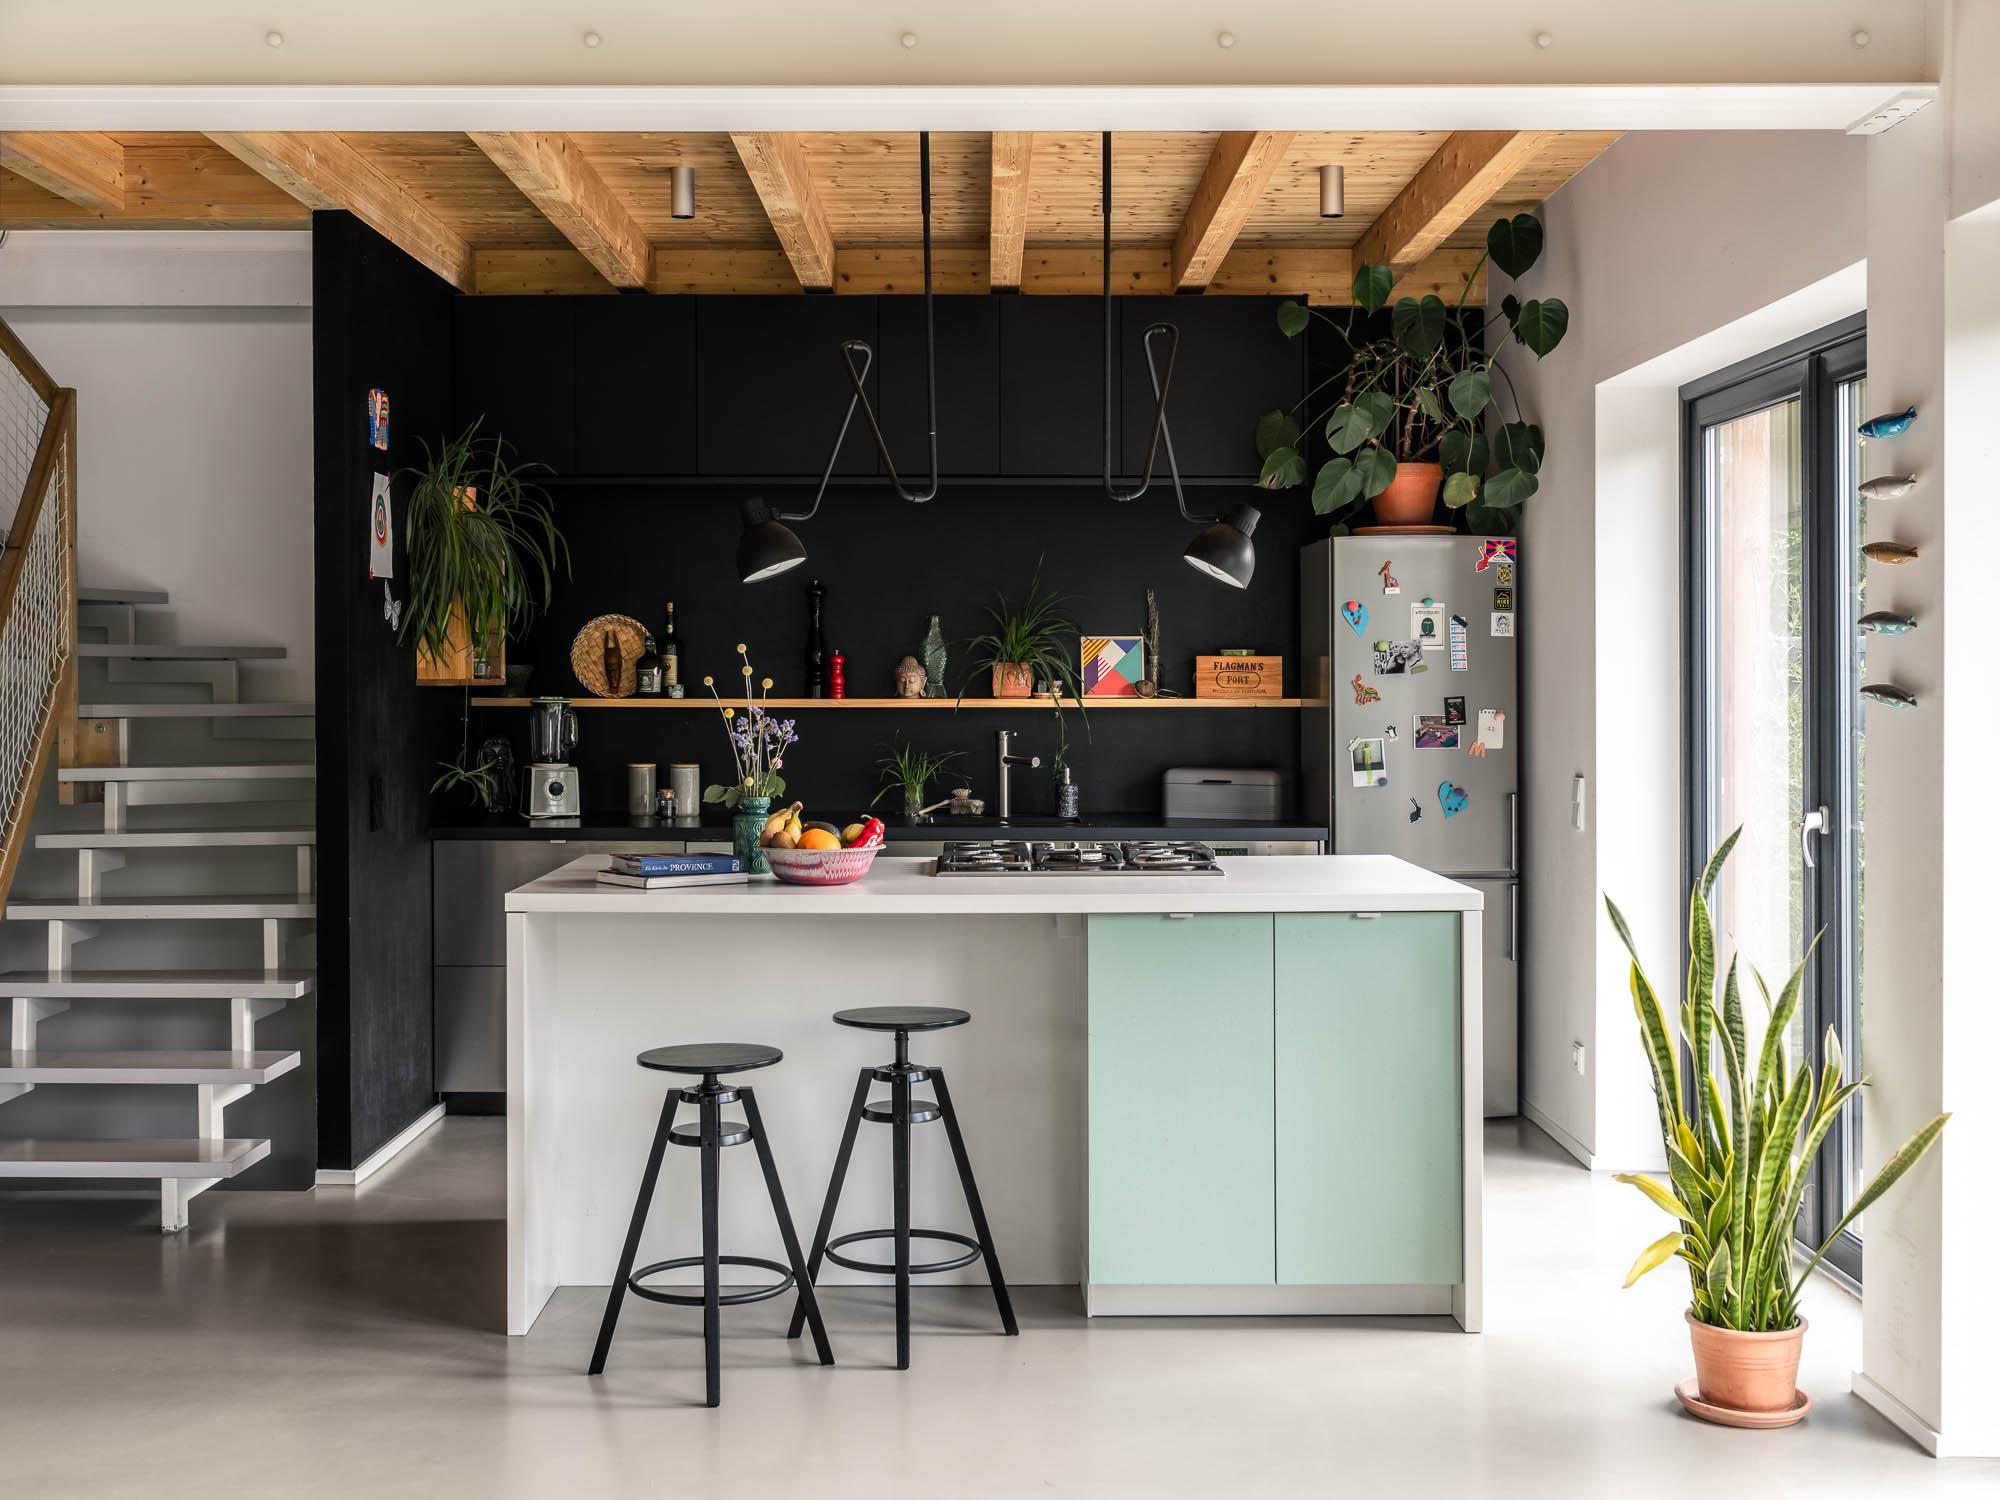 Kunterbunte Homestory im nachhaltigen Holzhaus © Magdalena Gruber